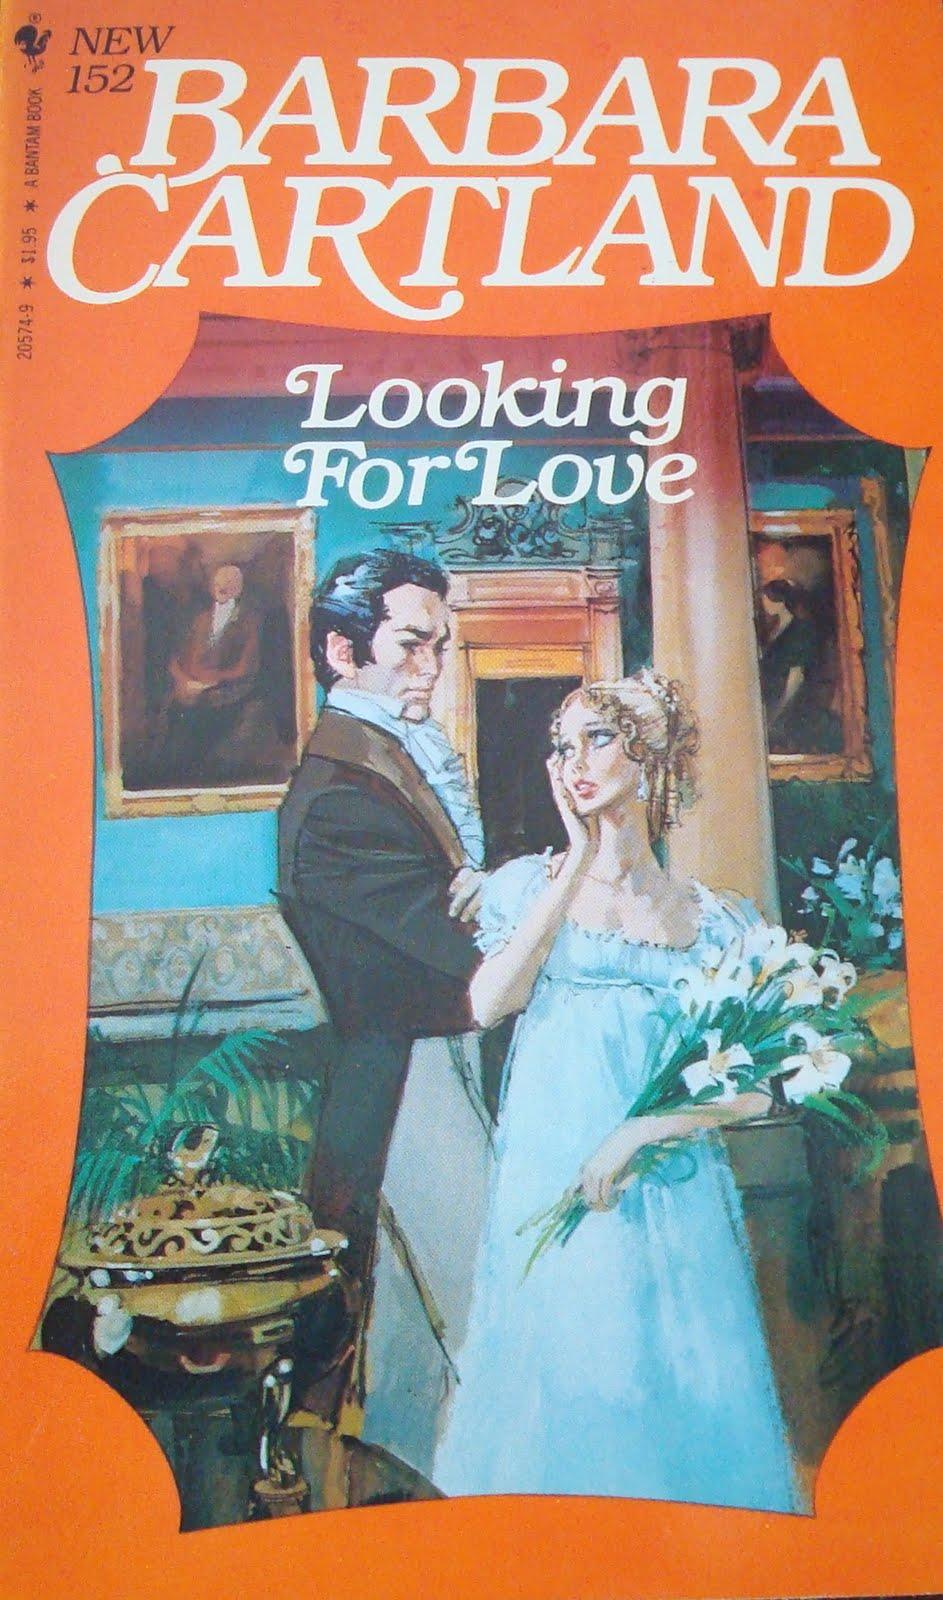 Adult escape romantic Read